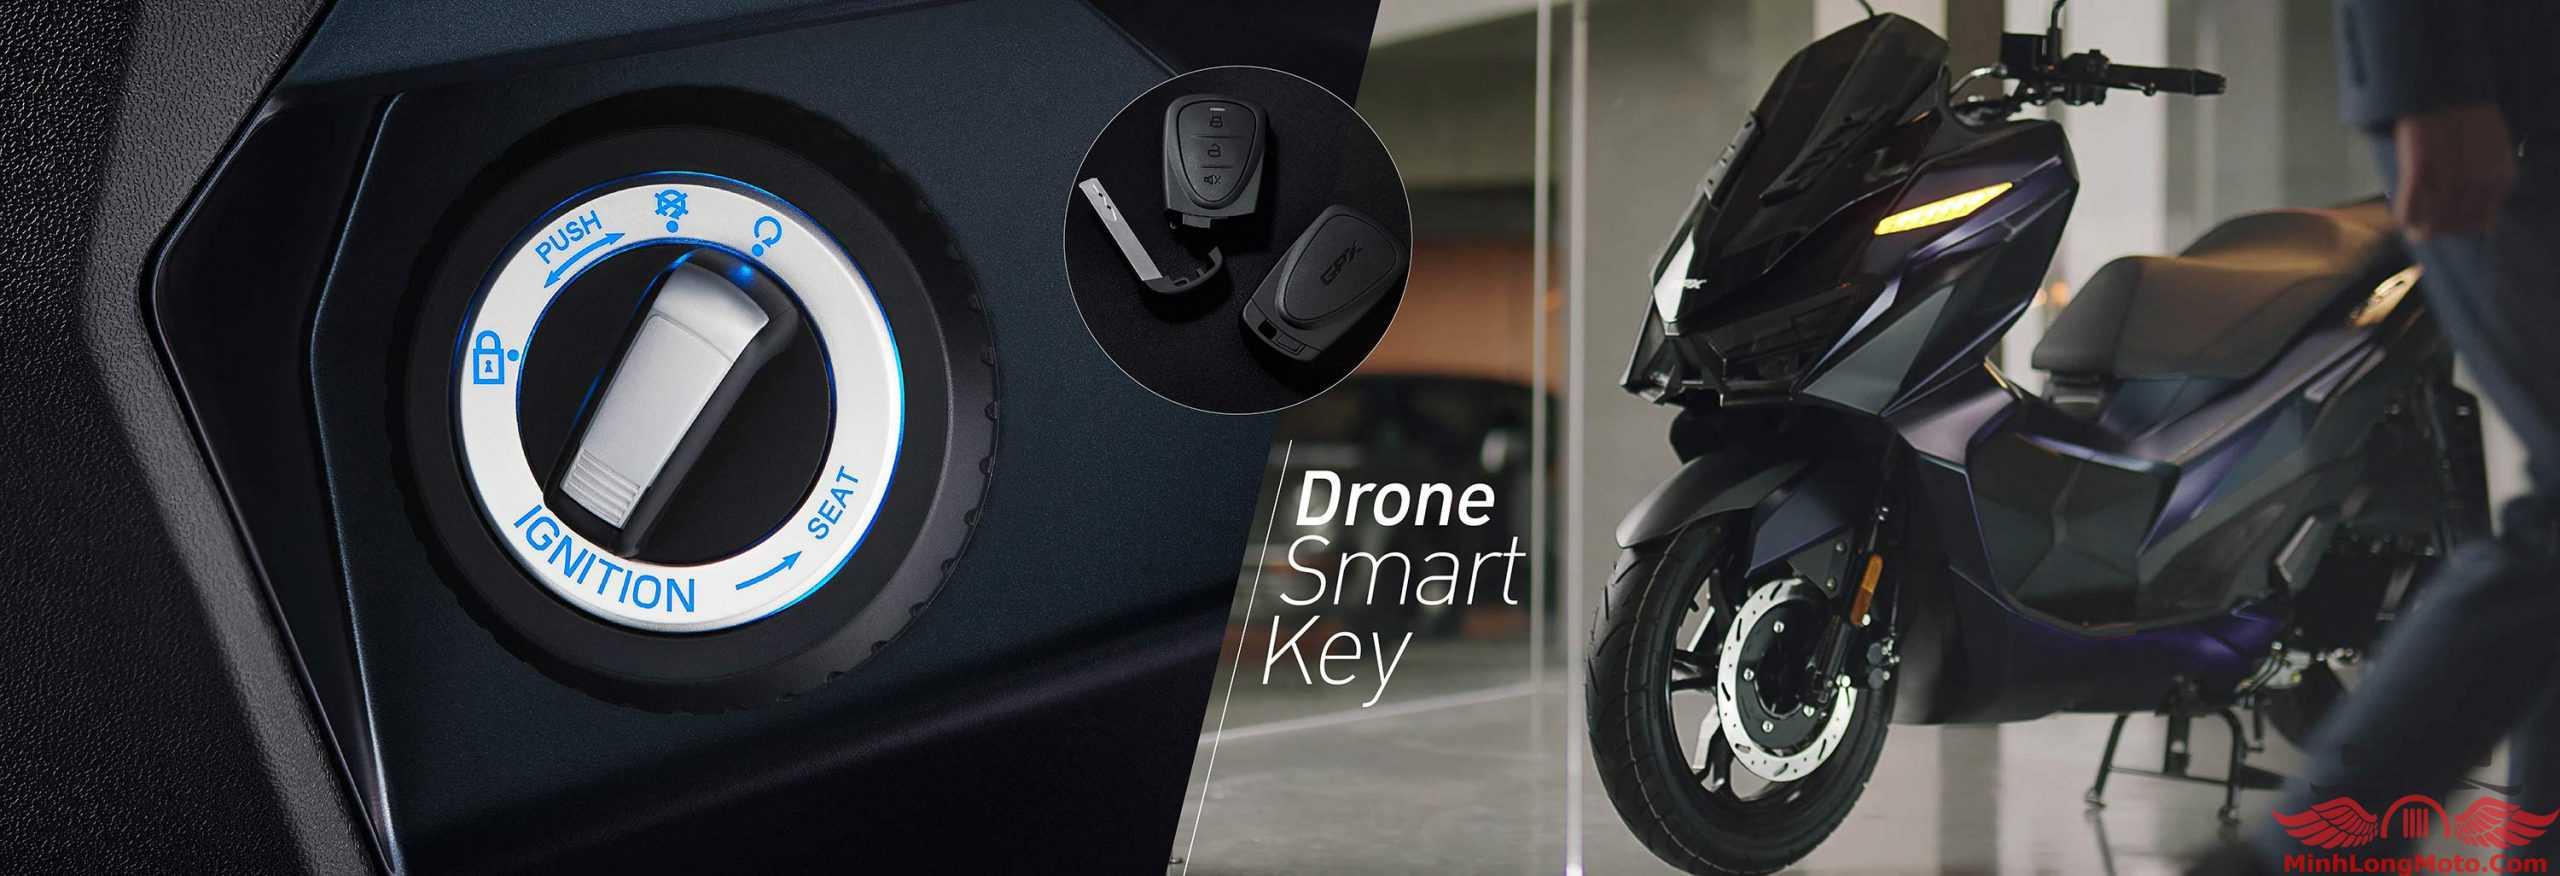 chìa khóa smarkey của GPX Drone